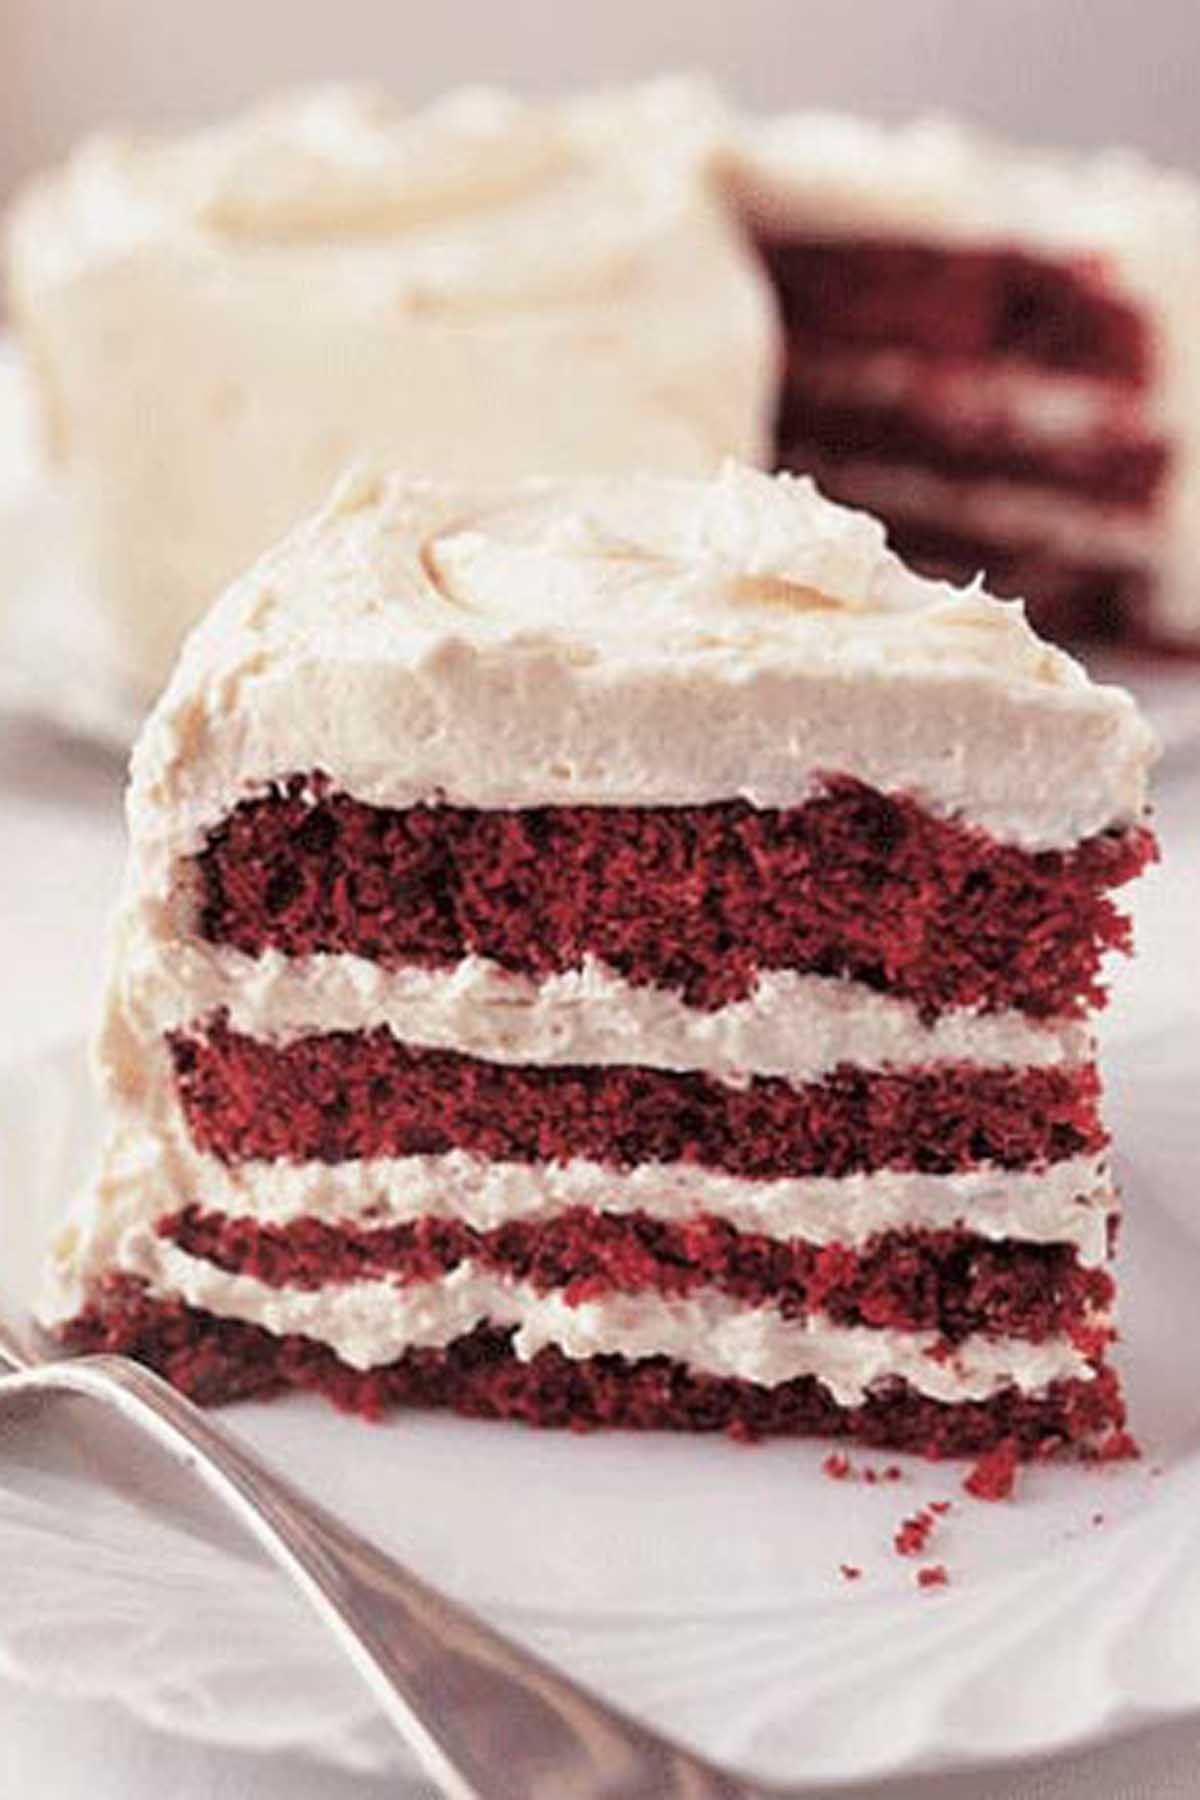 65 Best Homemade Cake Recipes How To Make An Easy Cake